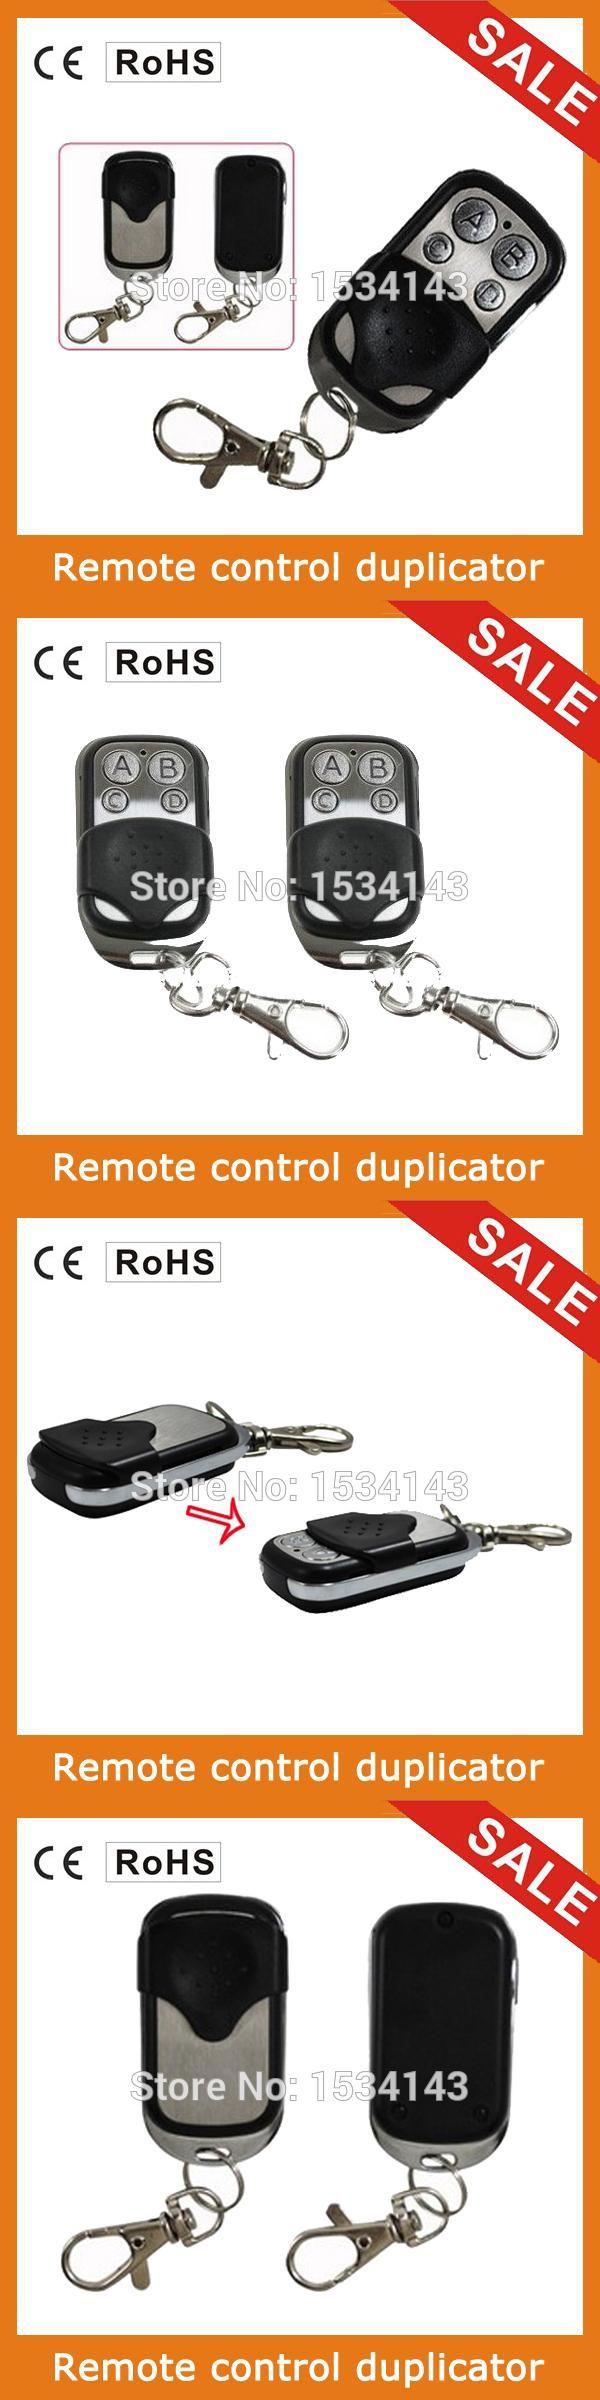 New Wireless Remote Control Copy controller Universal Handle Garage Door Electric Door Family Security Alarm Control